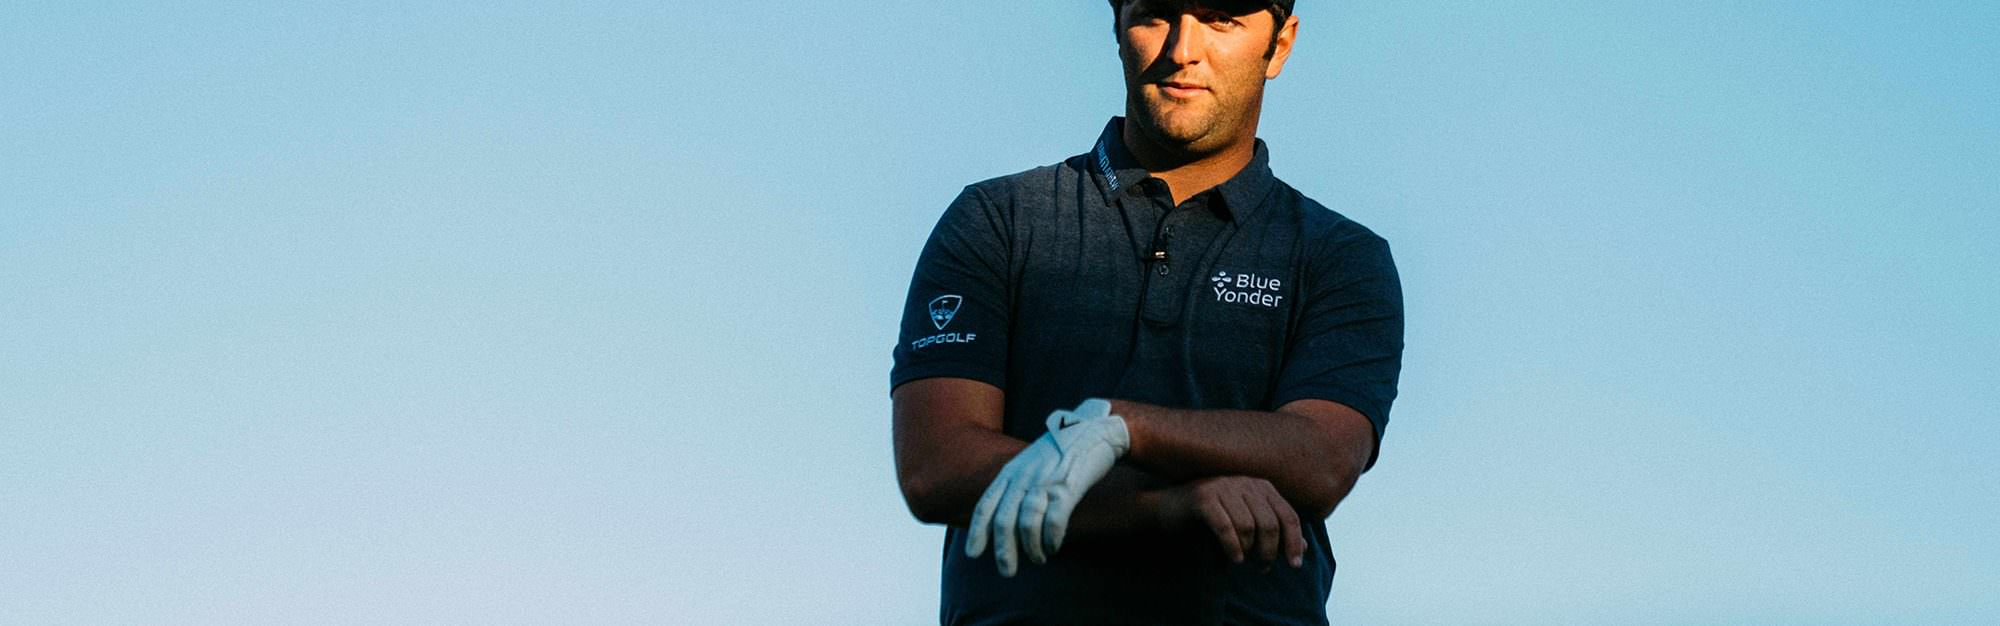 Golf world rankings: Men's and women's top 10